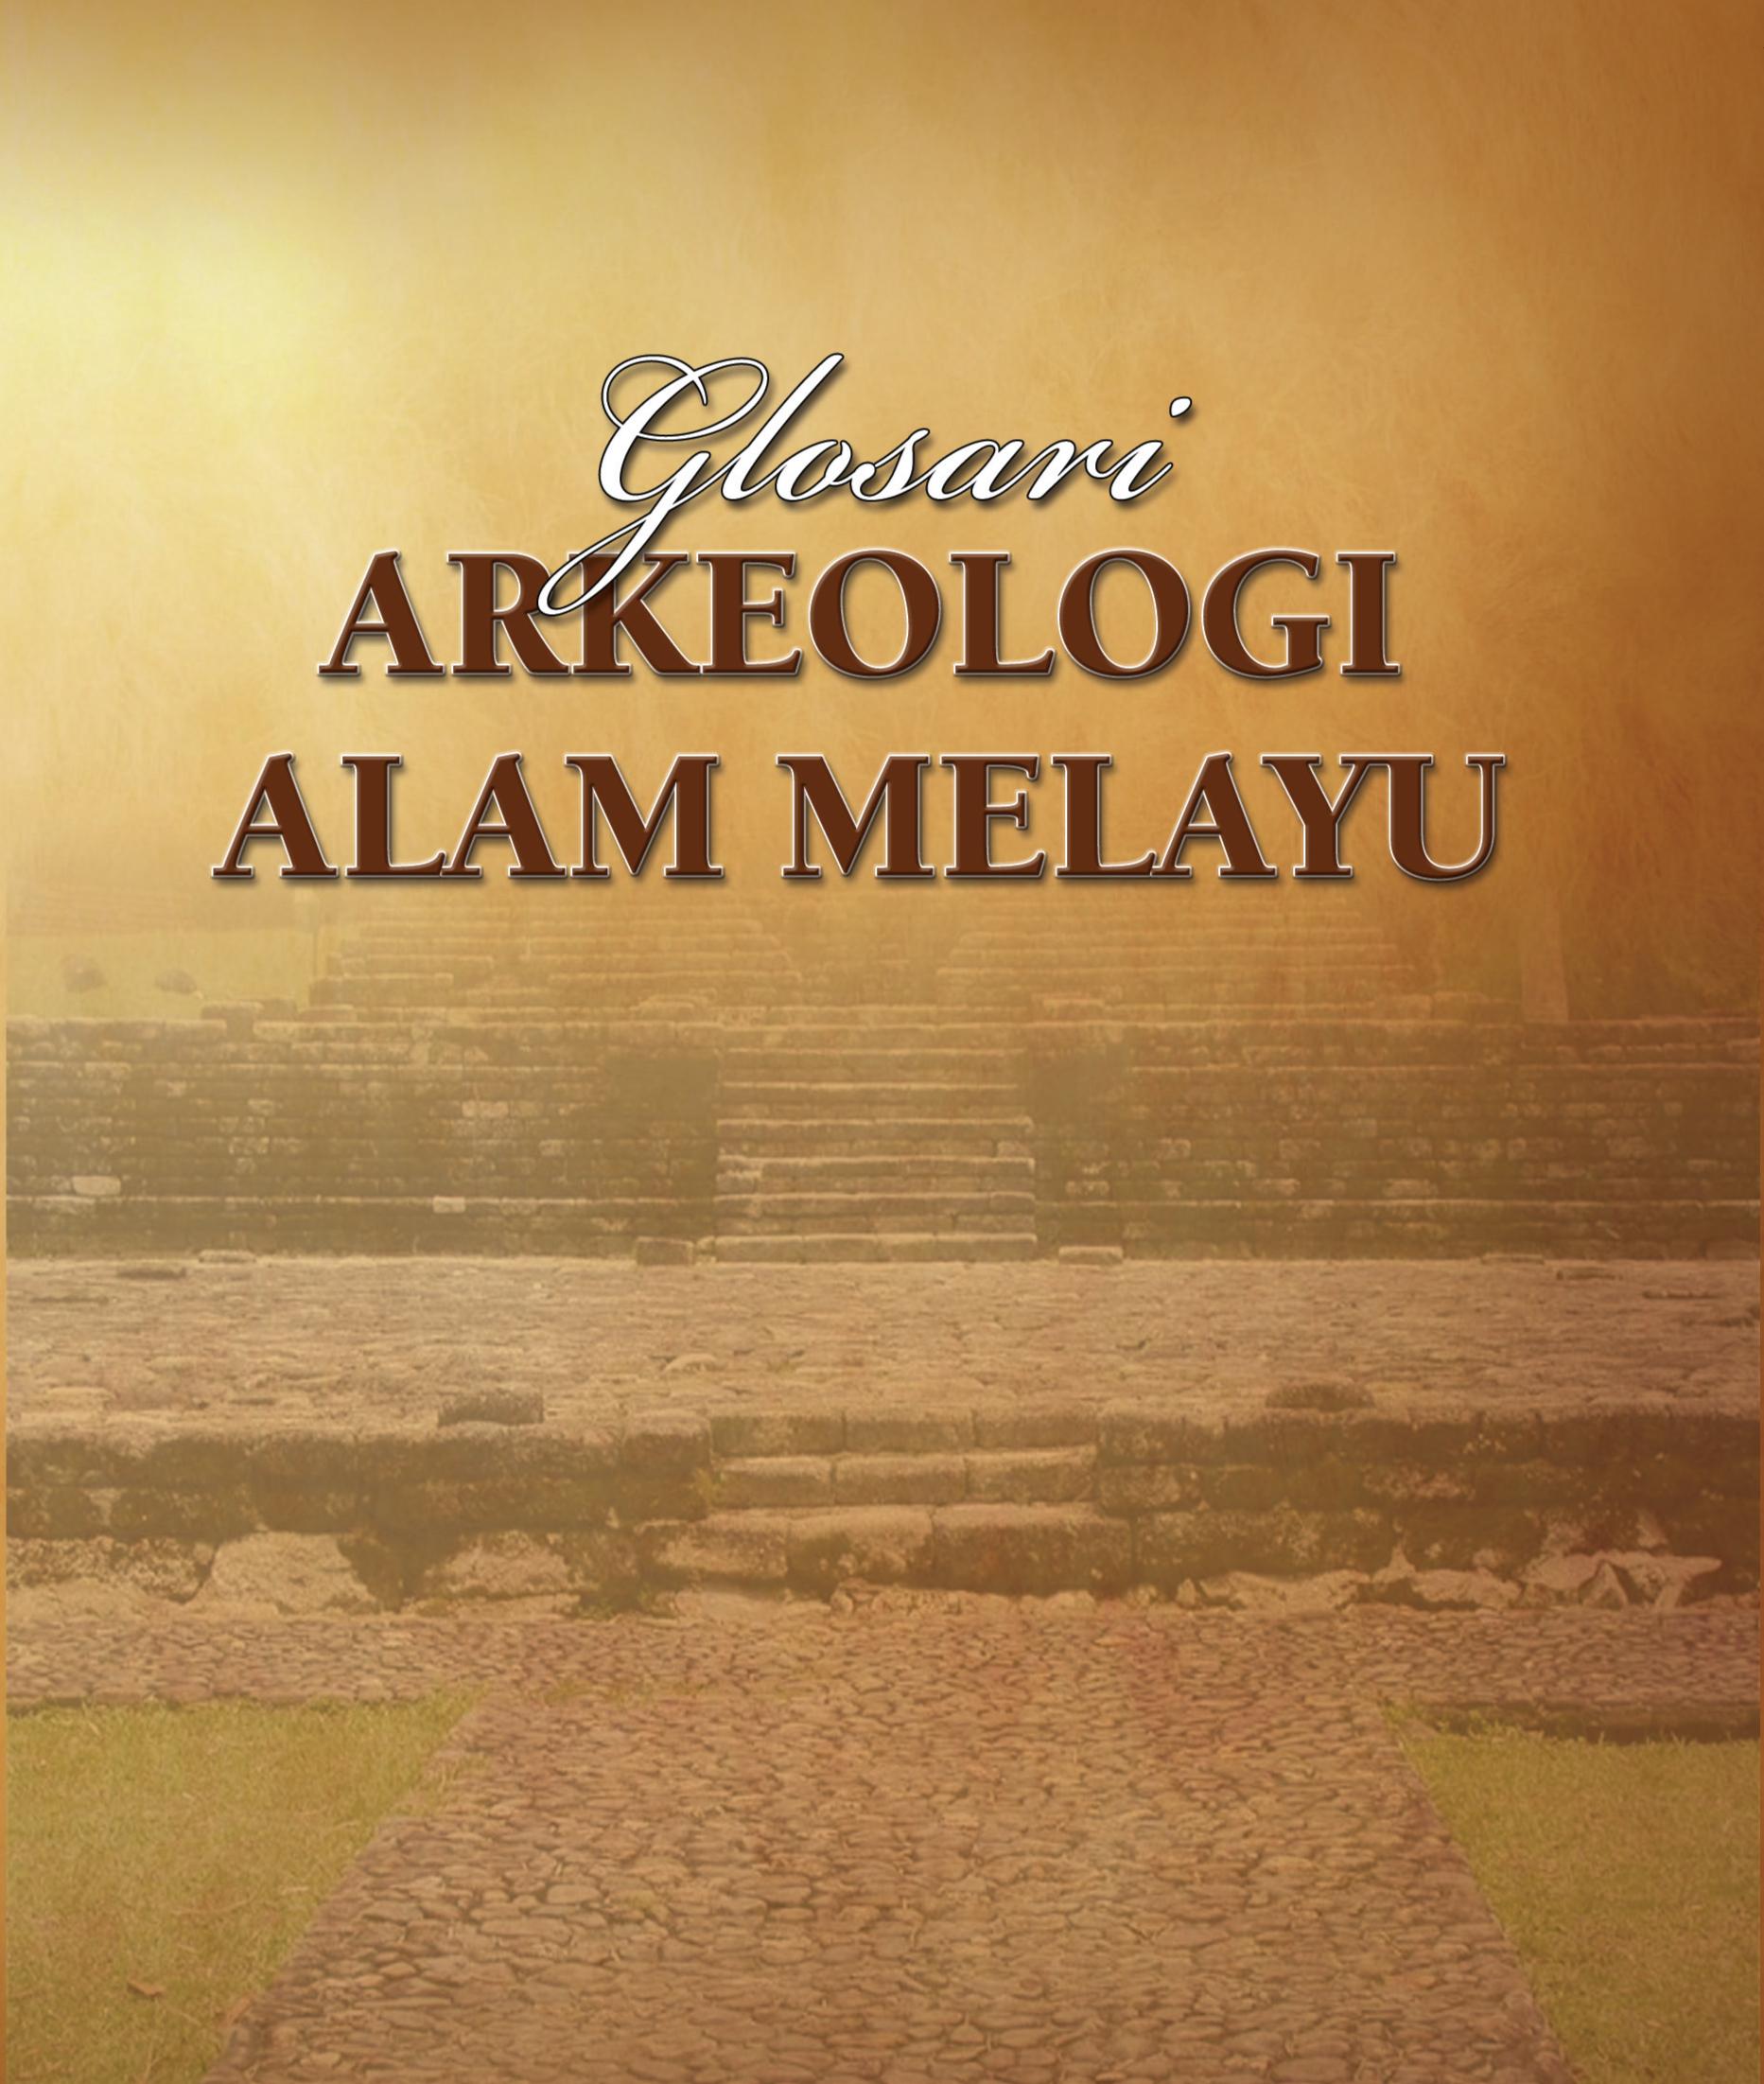 Glosari Arkeologi Alam Melayu